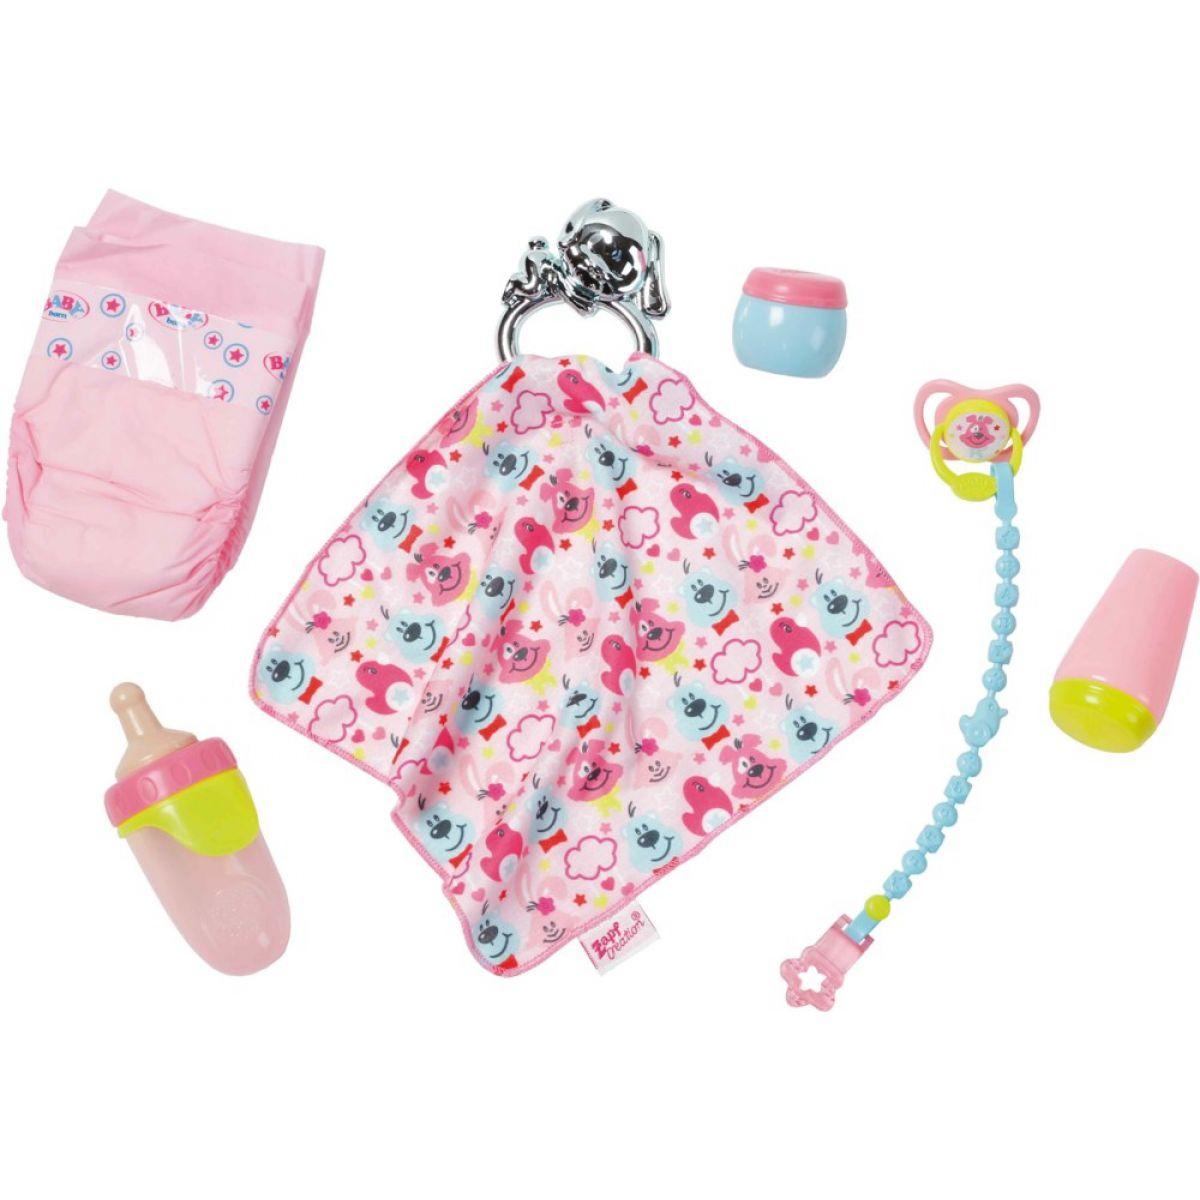 BABY born Výbavička pro miminko